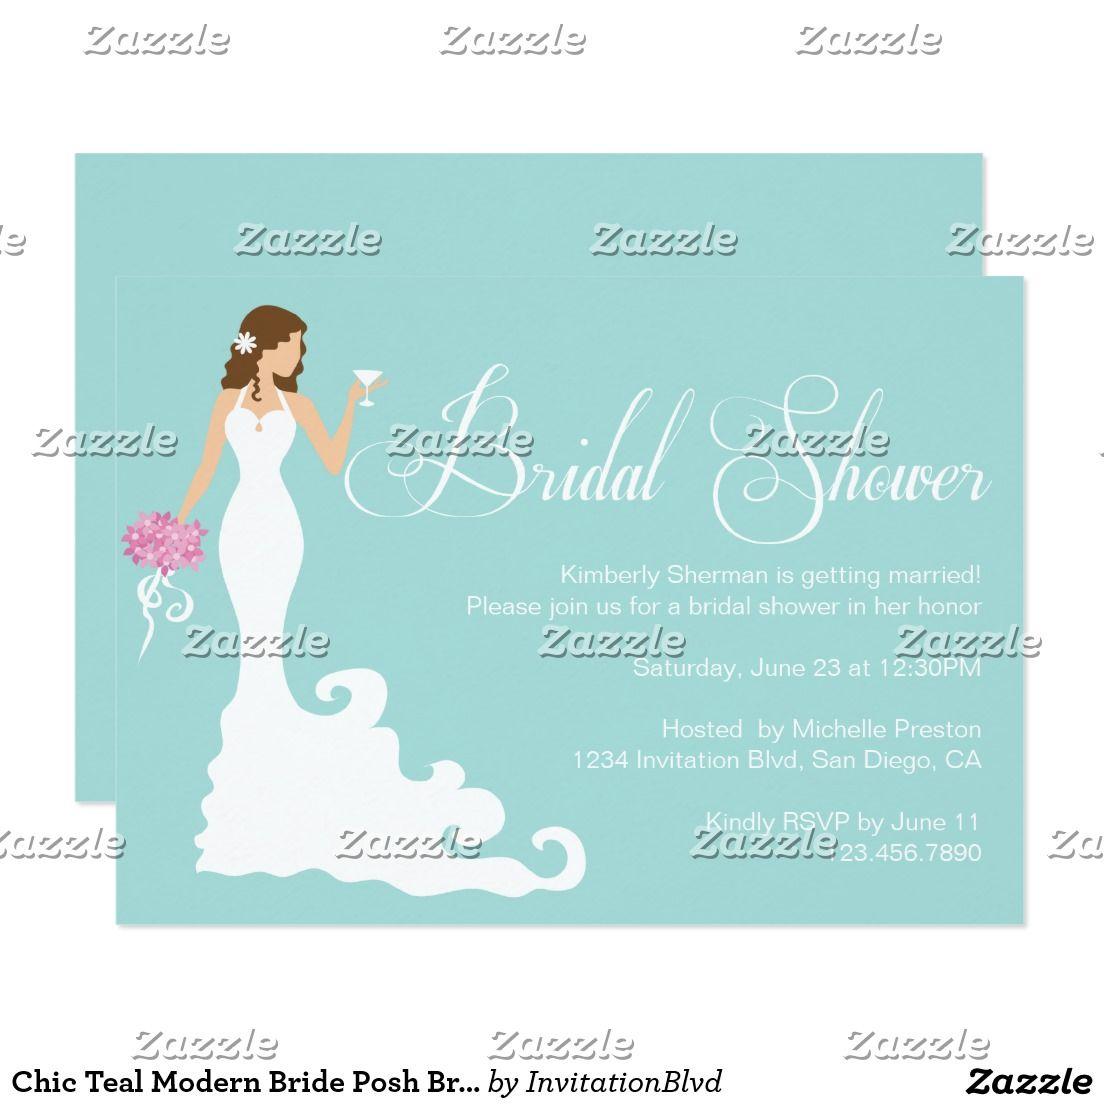 Chic Teal Modern Bride Posh Bridal Shower Invite Tea Party